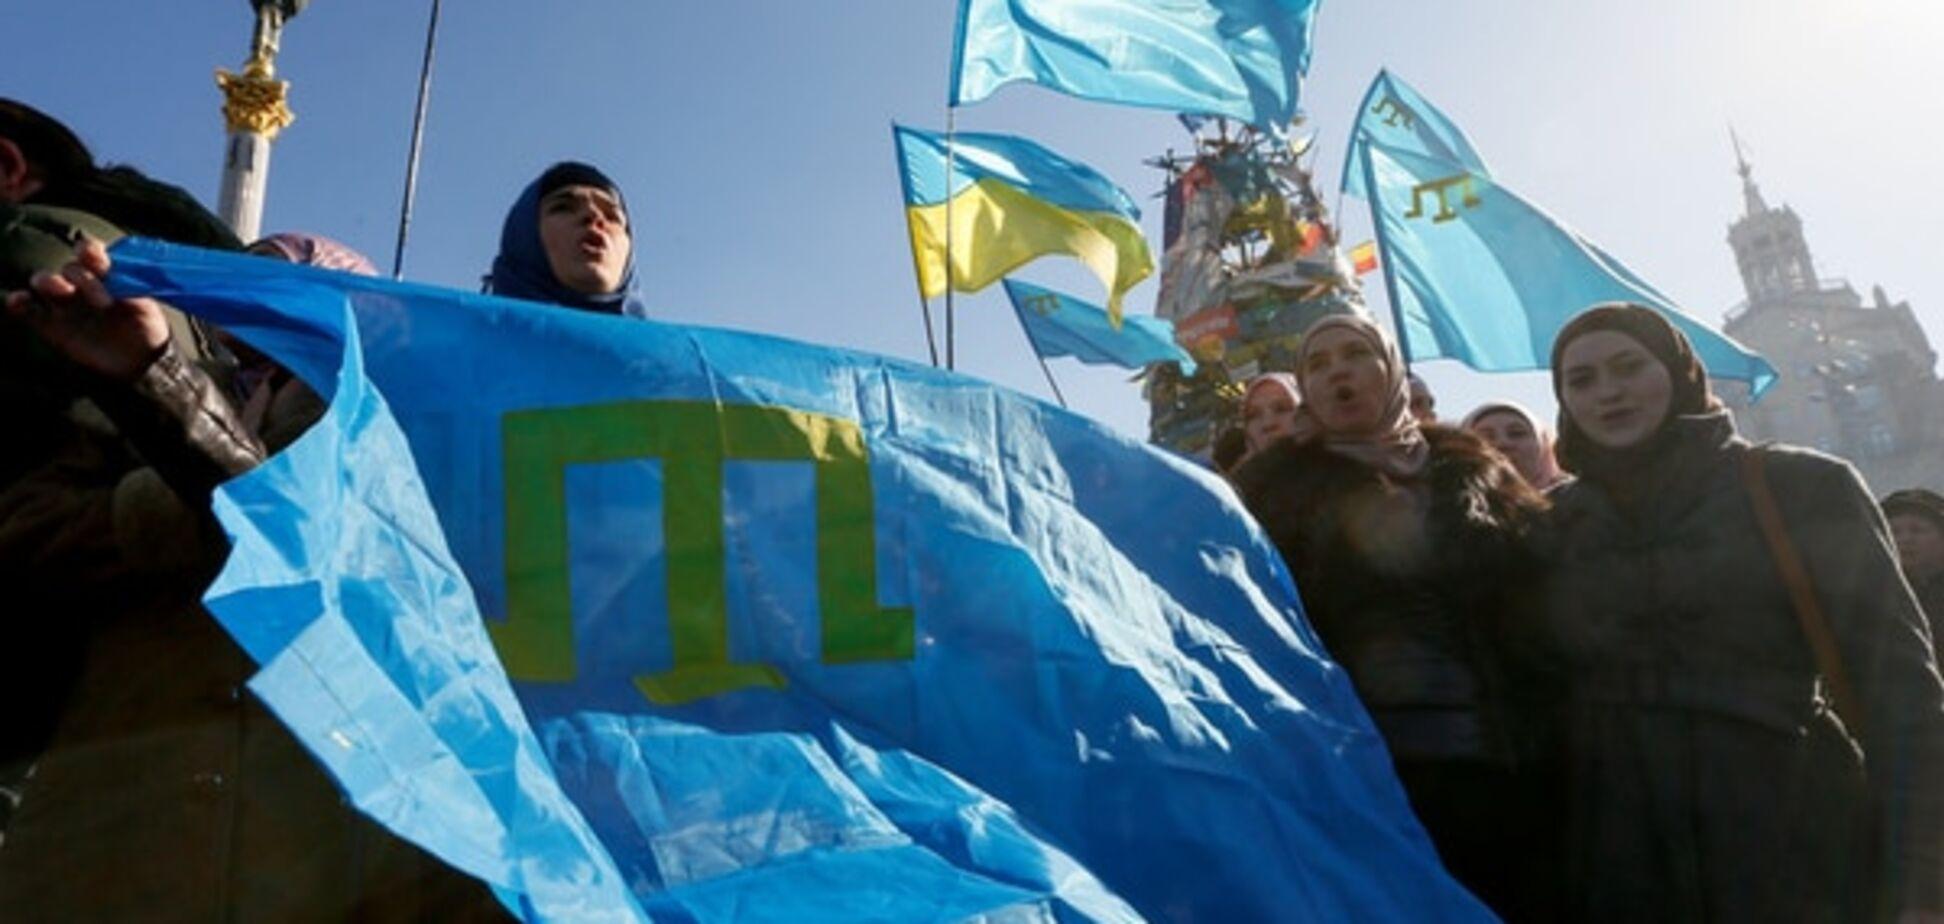 Рада признала геноцид крымскотатарского народа